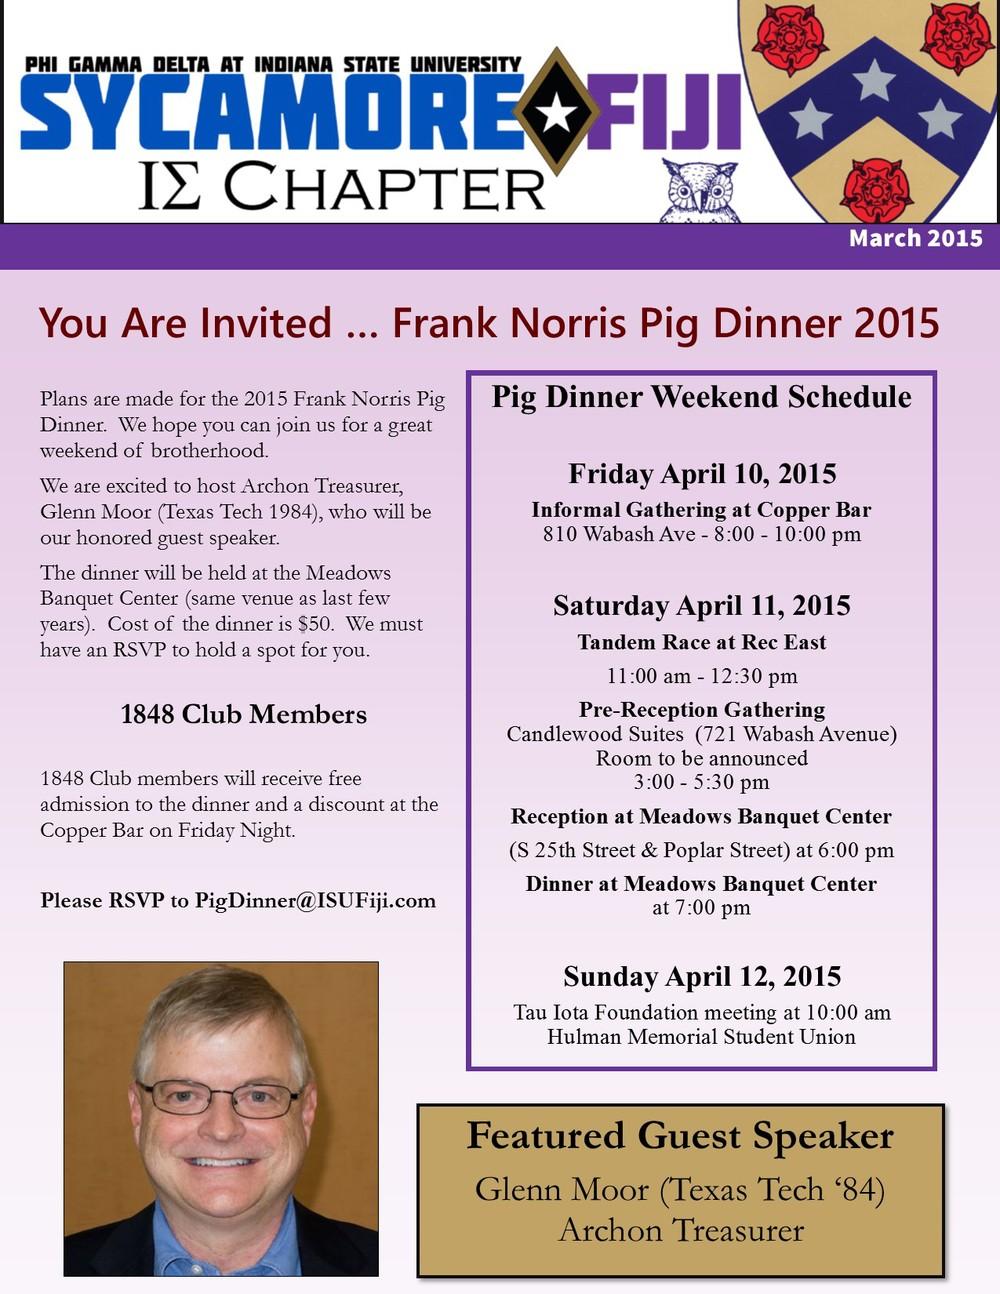 ISU FIJI e-Newsletter - March 2015 - 1.jpg